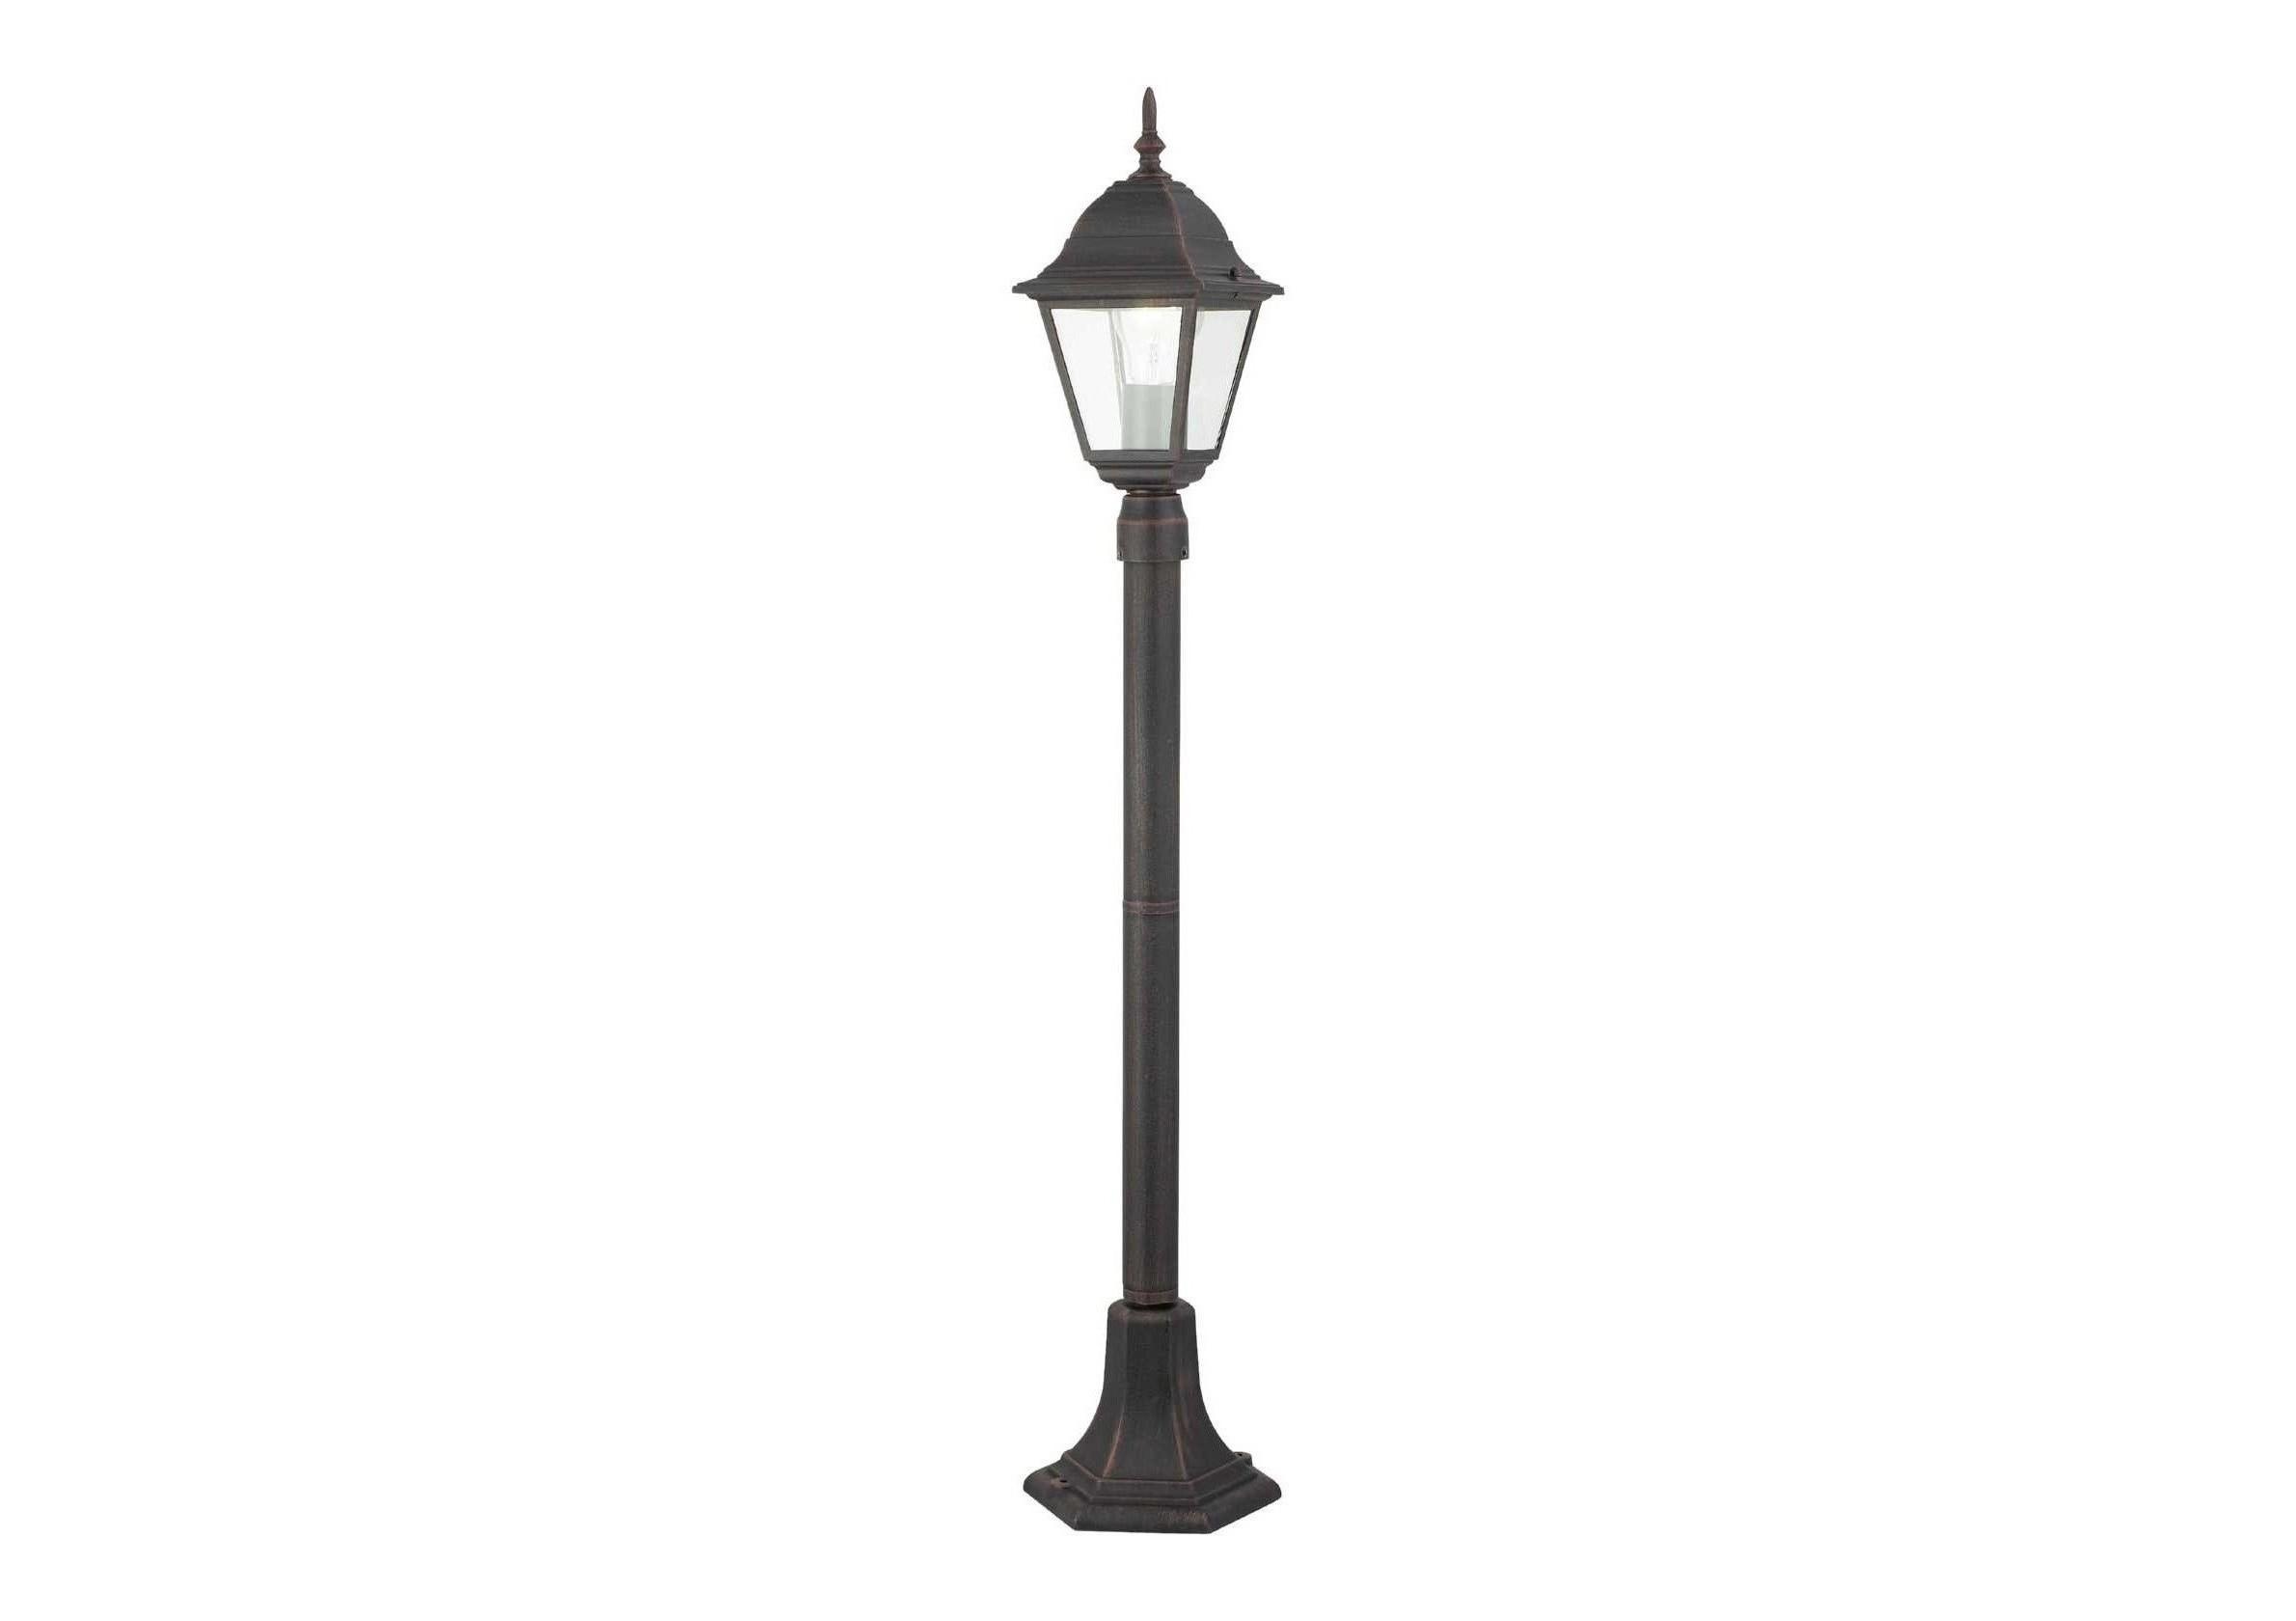 Светильник уличный NEWPORTУличные наземные светильники<br>&amp;lt;div&amp;gt;Тип цоколя: E27&amp;lt;/div&amp;gt;&amp;lt;div&amp;gt;Мощность лампы: 60W&amp;lt;/div&amp;gt;&amp;lt;div&amp;gt;Количество ламп: 1&amp;lt;/div&amp;gt;&amp;lt;div&amp;gt;Наличие ламп: нет&amp;lt;/div&amp;gt;<br><br>Material: Металл<br>Width см: 14<br>Depth см: 14<br>Height см: 102<br>Diameter см: None